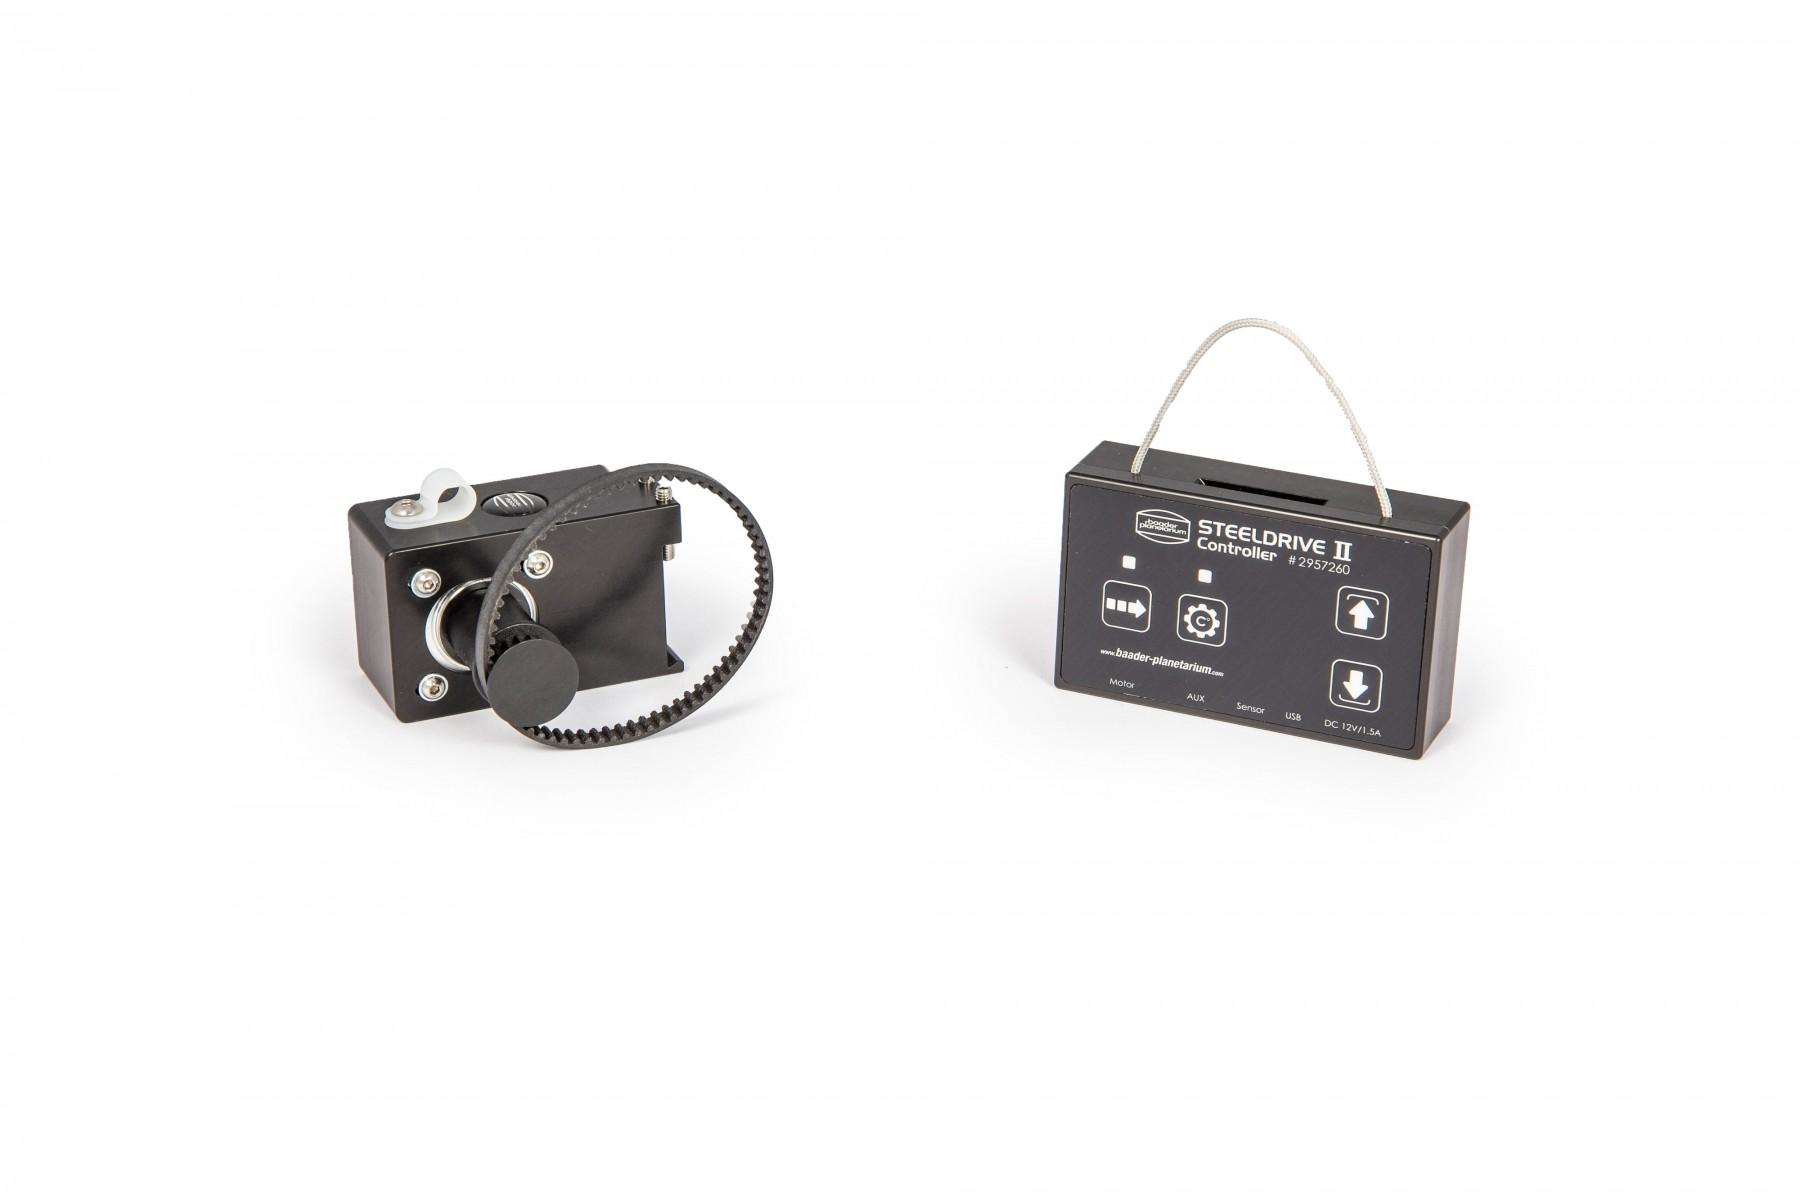 Anwendungsbild: Baader Steeldrive II inkl. Controller (Set)